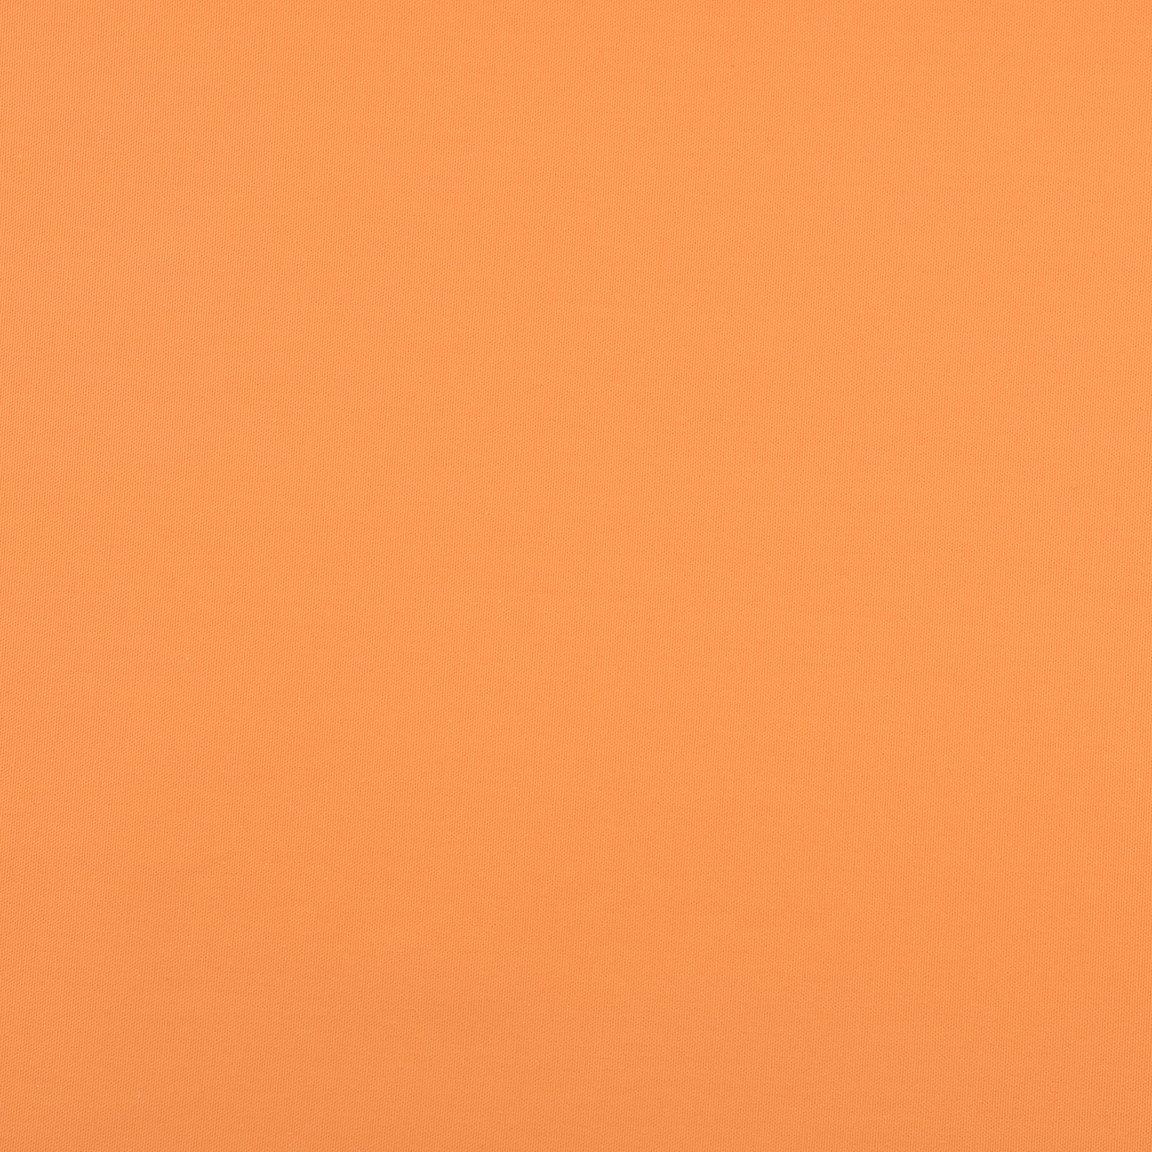 West Bay - Solid Tangerine